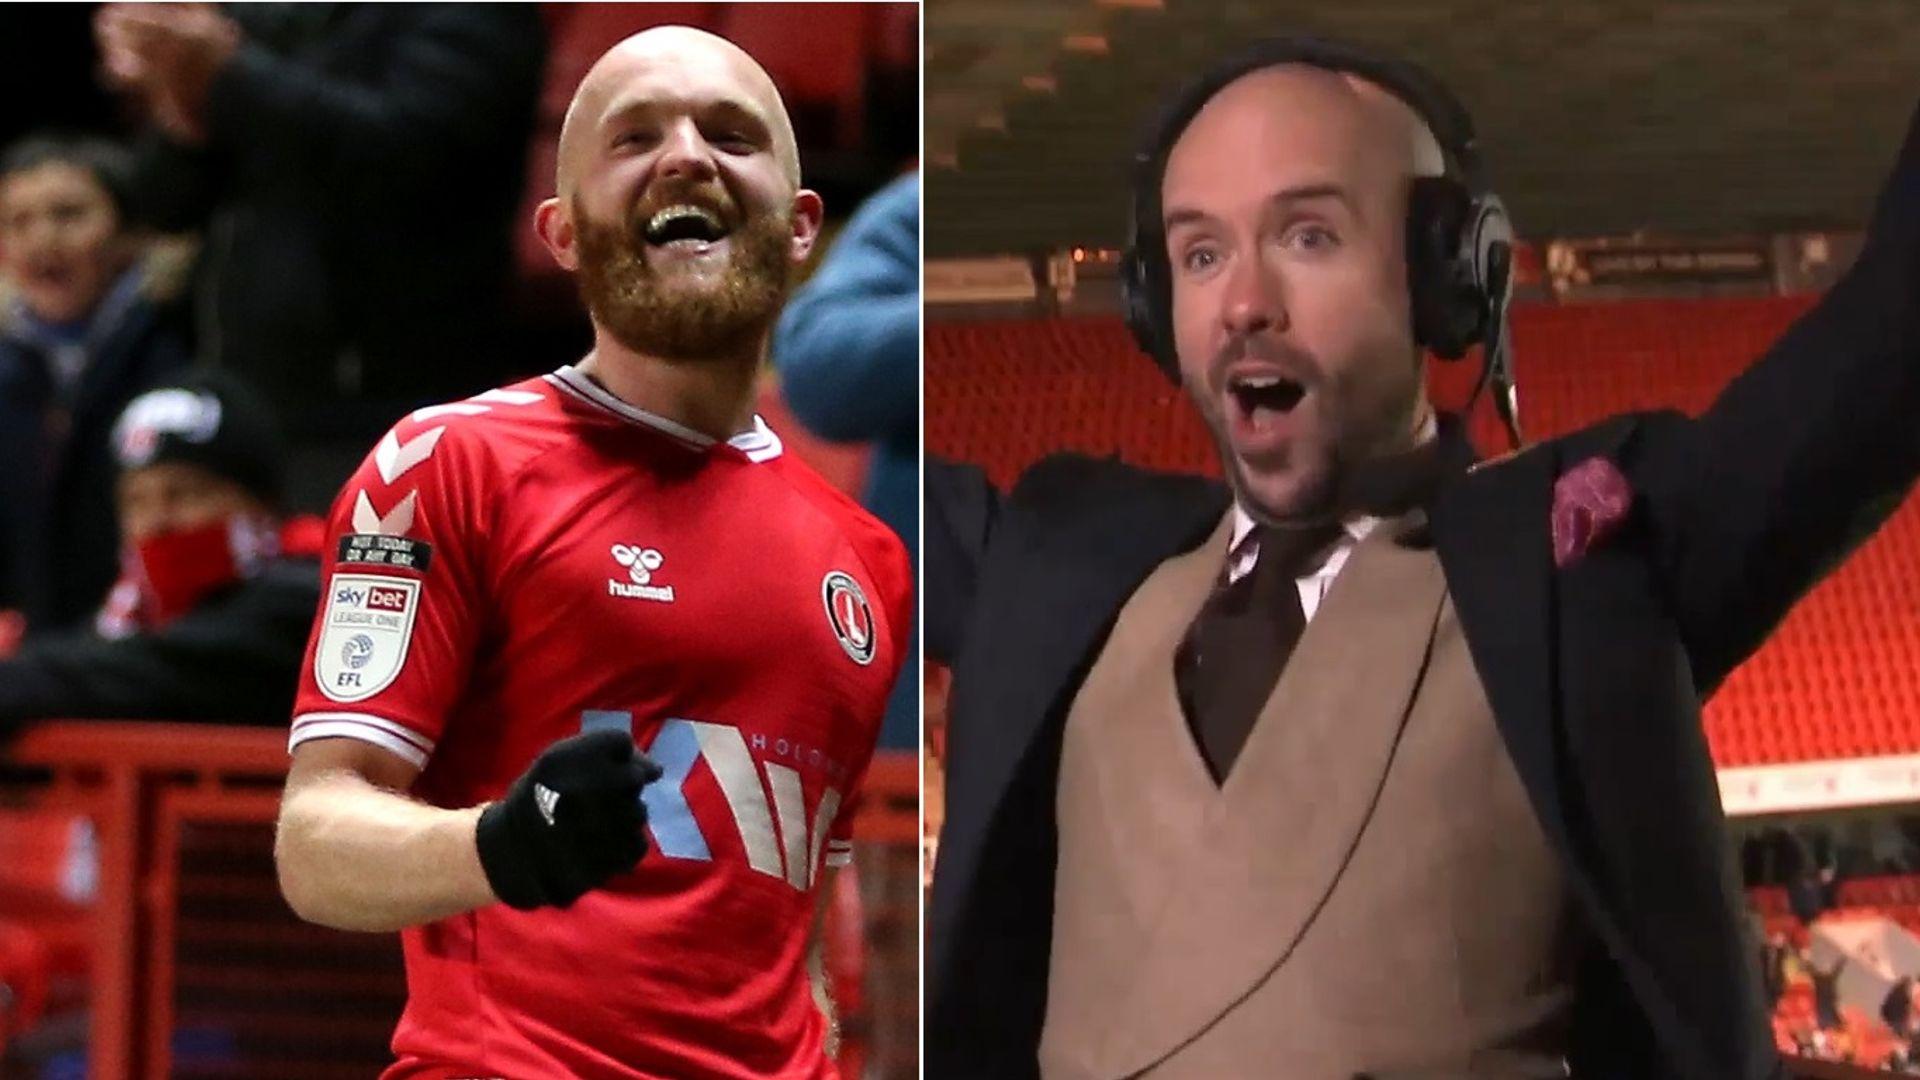 'He looks just like me!' - Tom Allen celebrates goal on Soccer Saturday